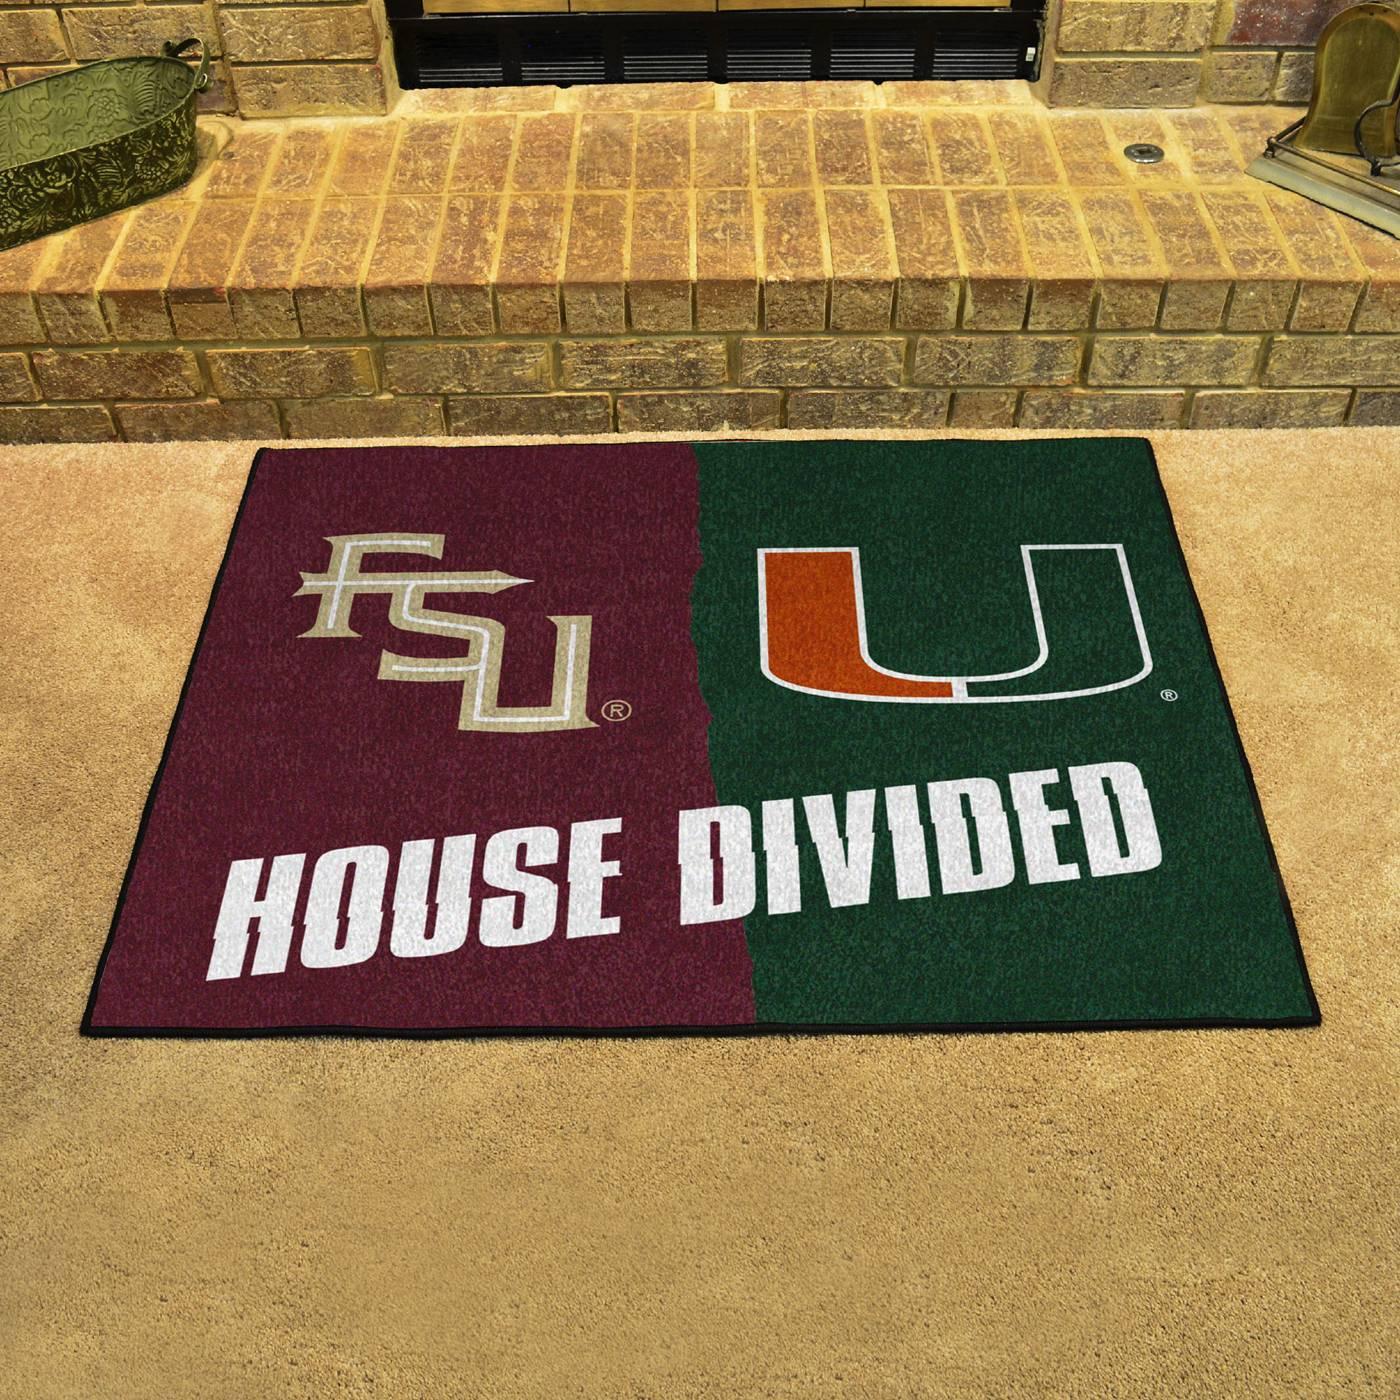 Florida State Seminoles Football Floor Mat: Florida State Seminoles/Miami Hurricanes House Divided Mat